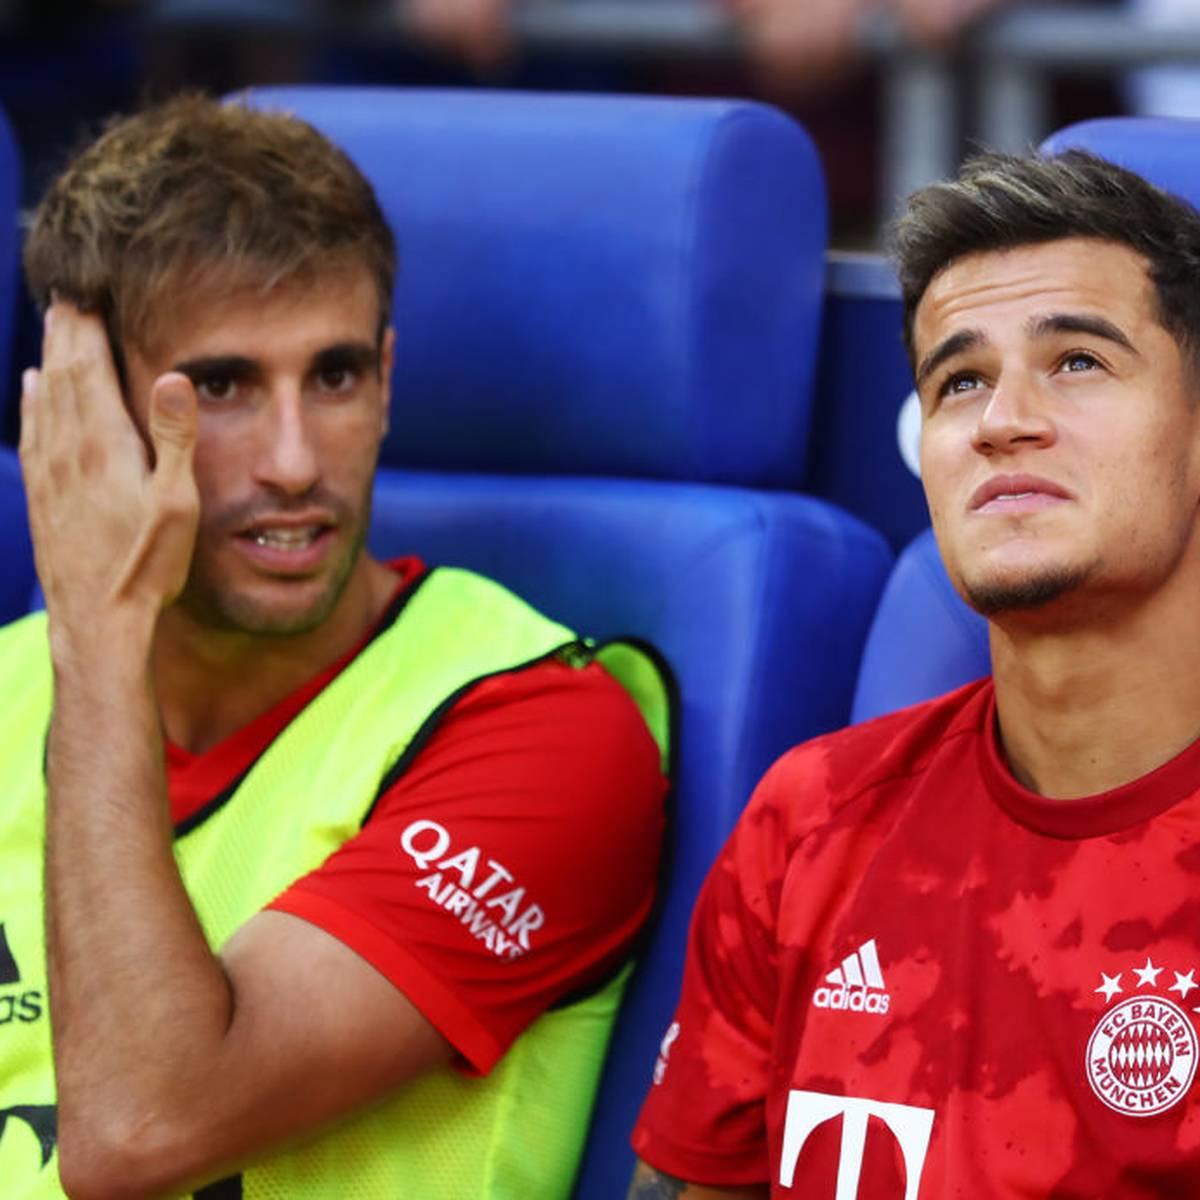 Hoeneß will Martínez, Kovac reagiert